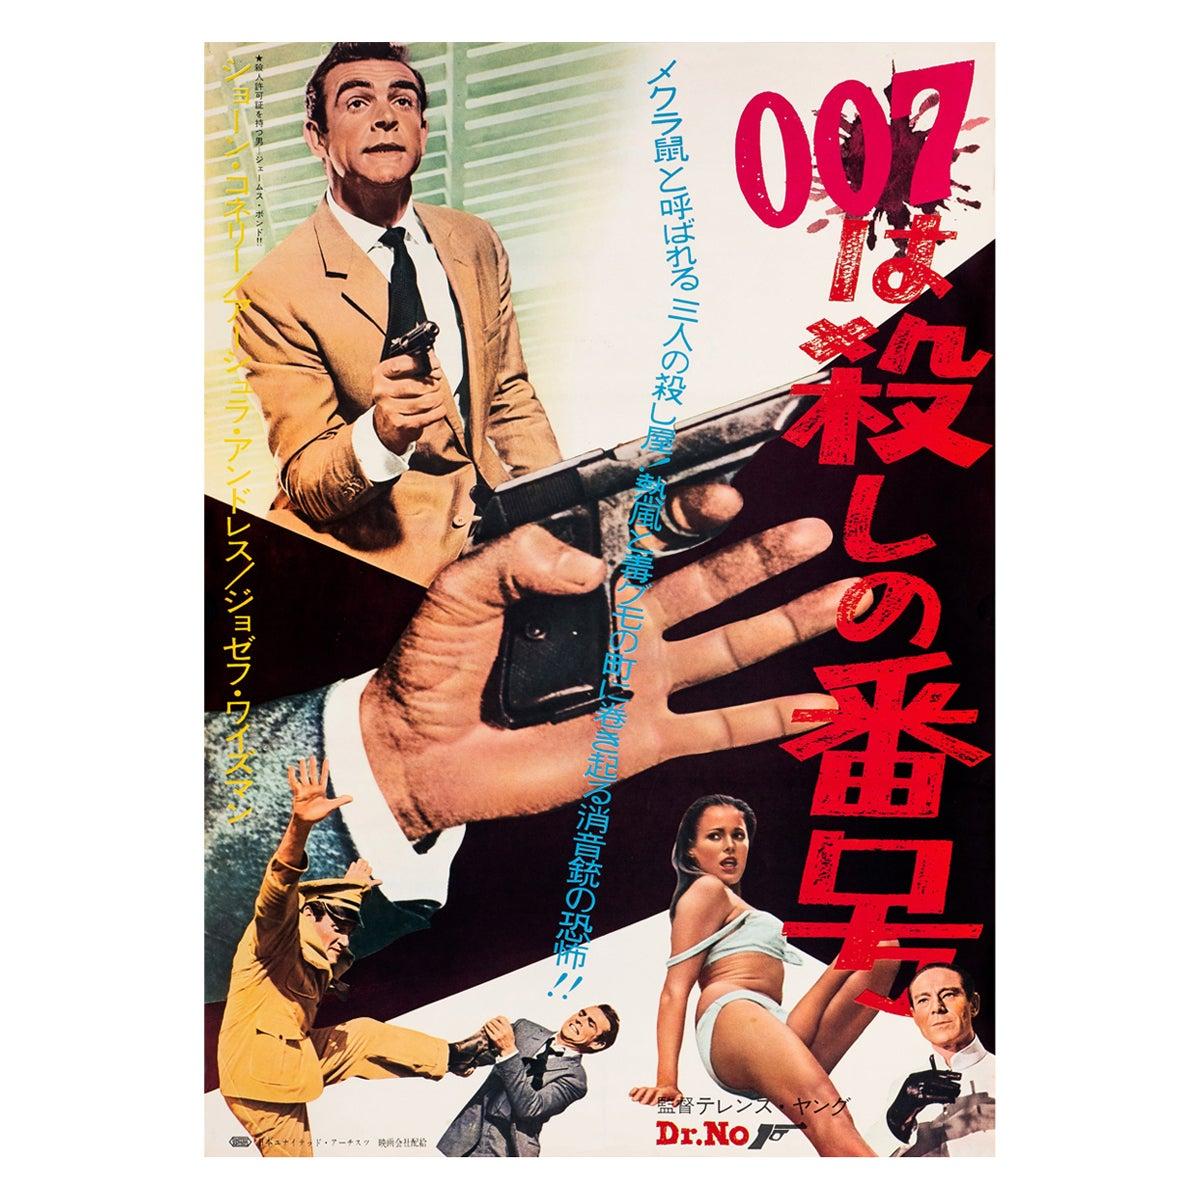 James Bond 'Dr. No.' Original Vintage Movie Poster, Japanese, 1963